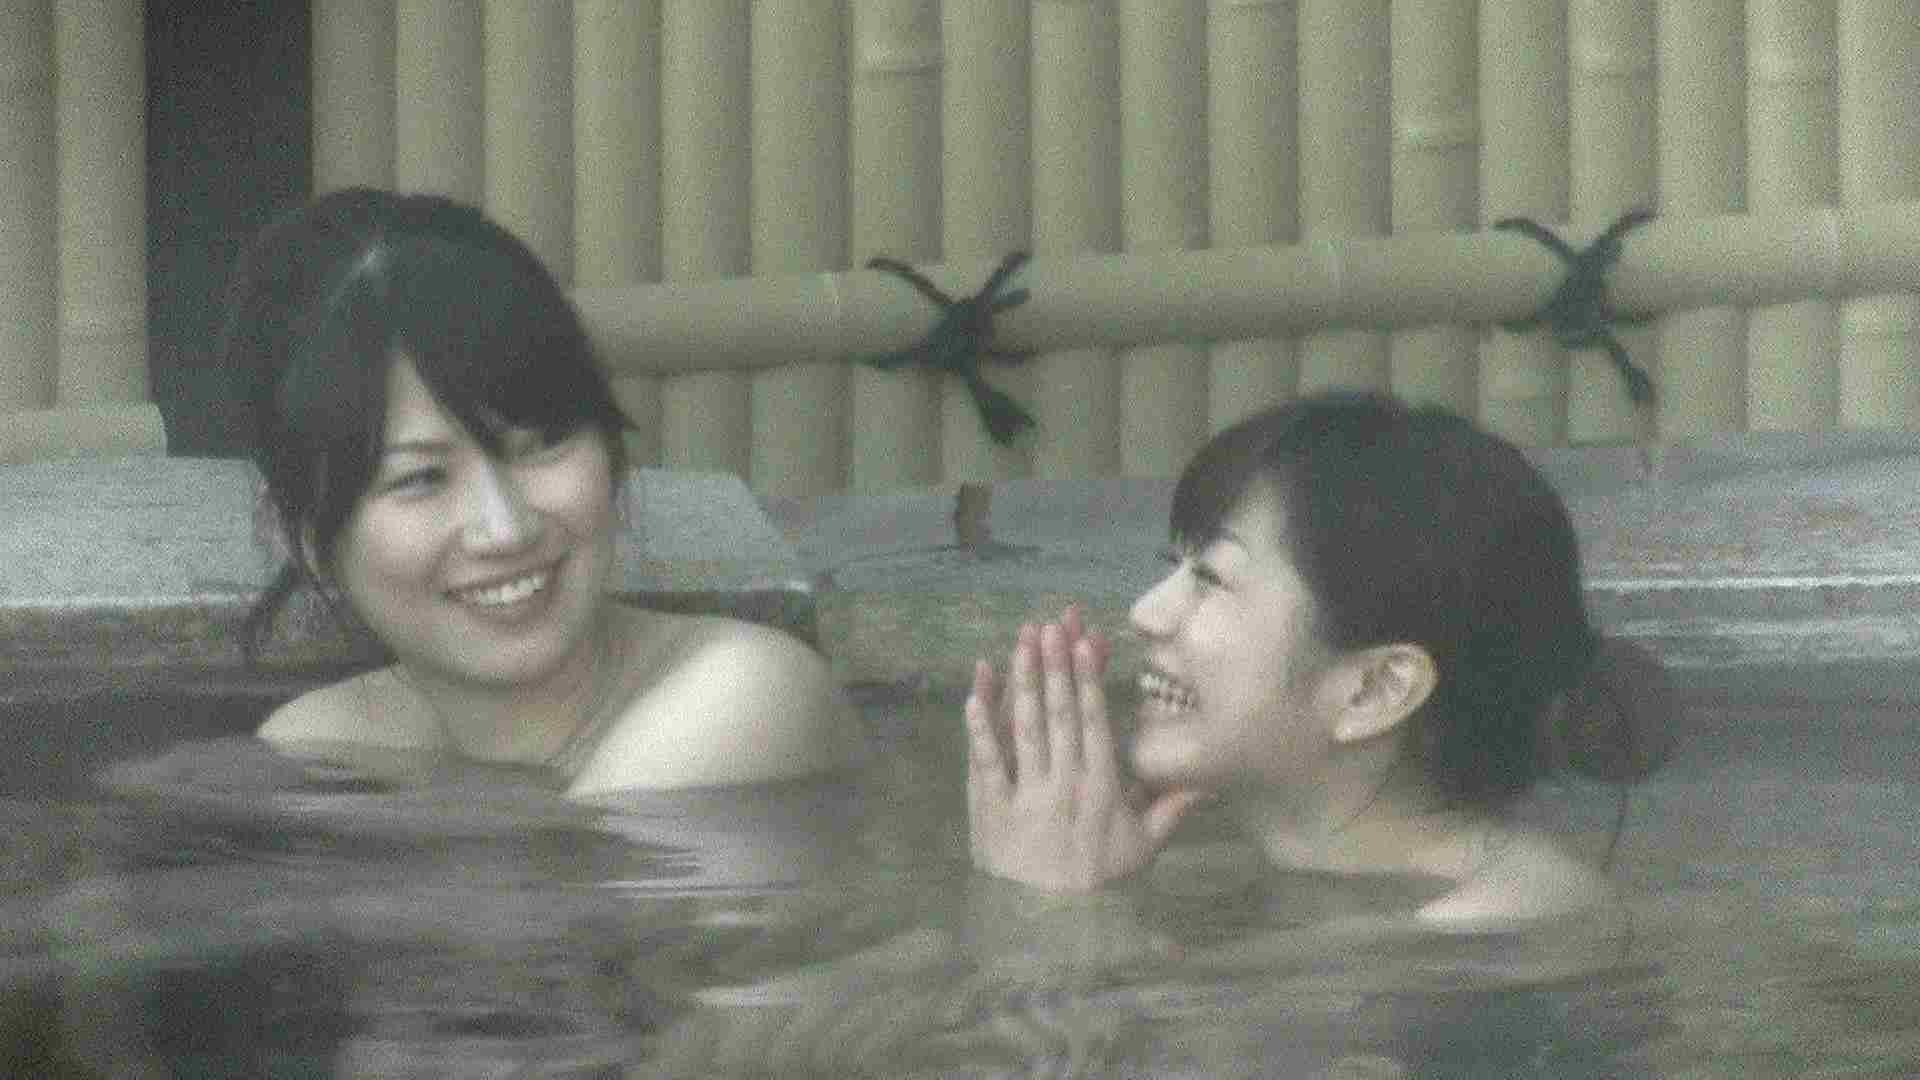 Aquaな露天風呂Vol.206 OLのプライベート  12pic 3